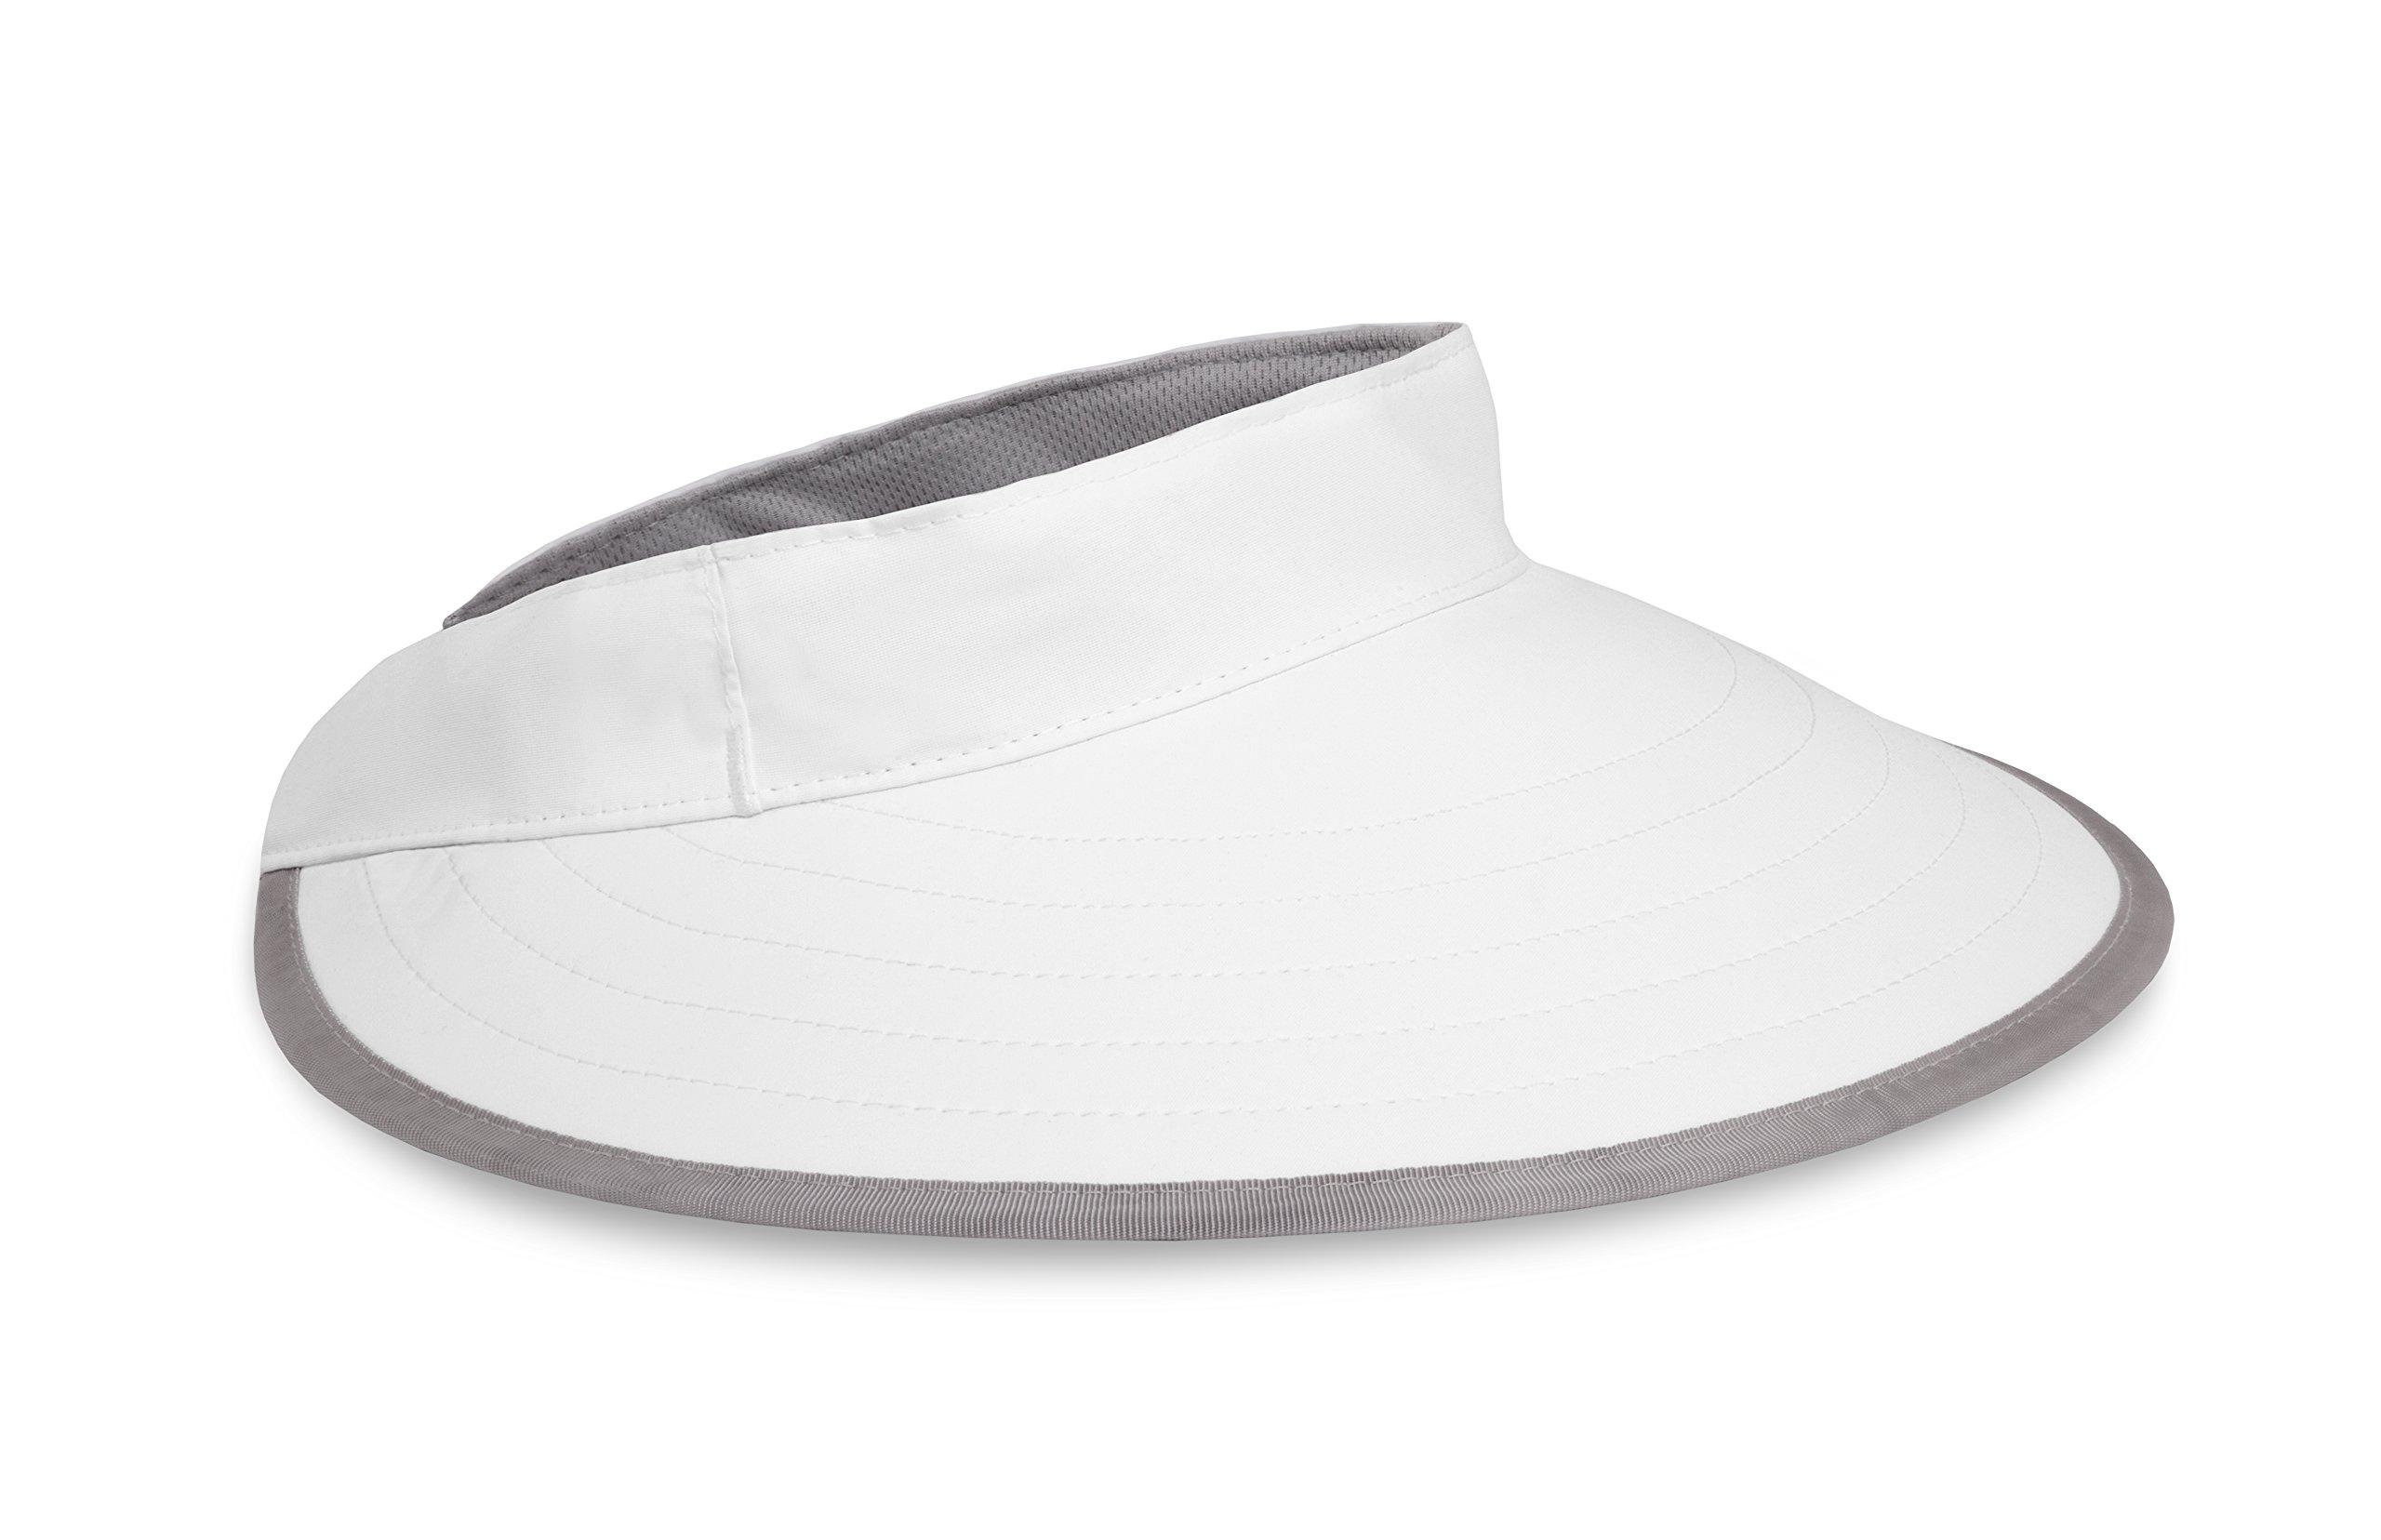 Sunday Afternoons Sport Visor, White, One Size